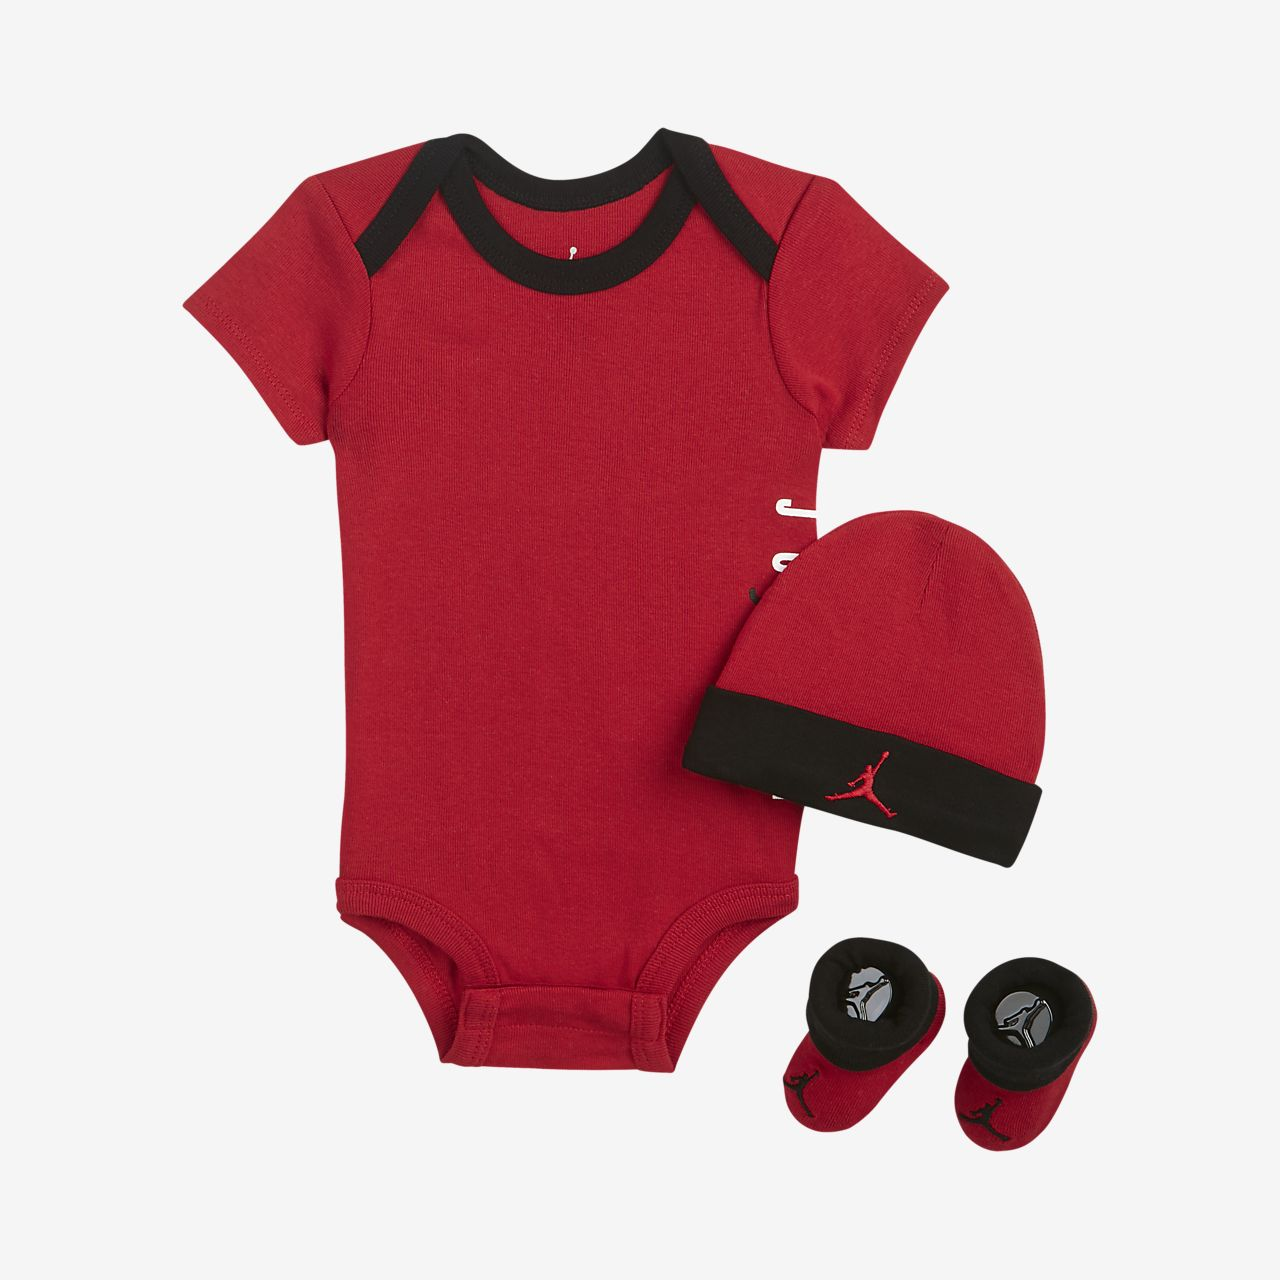 Trojdílná kojenecká souprava Jordan Jumpman Air